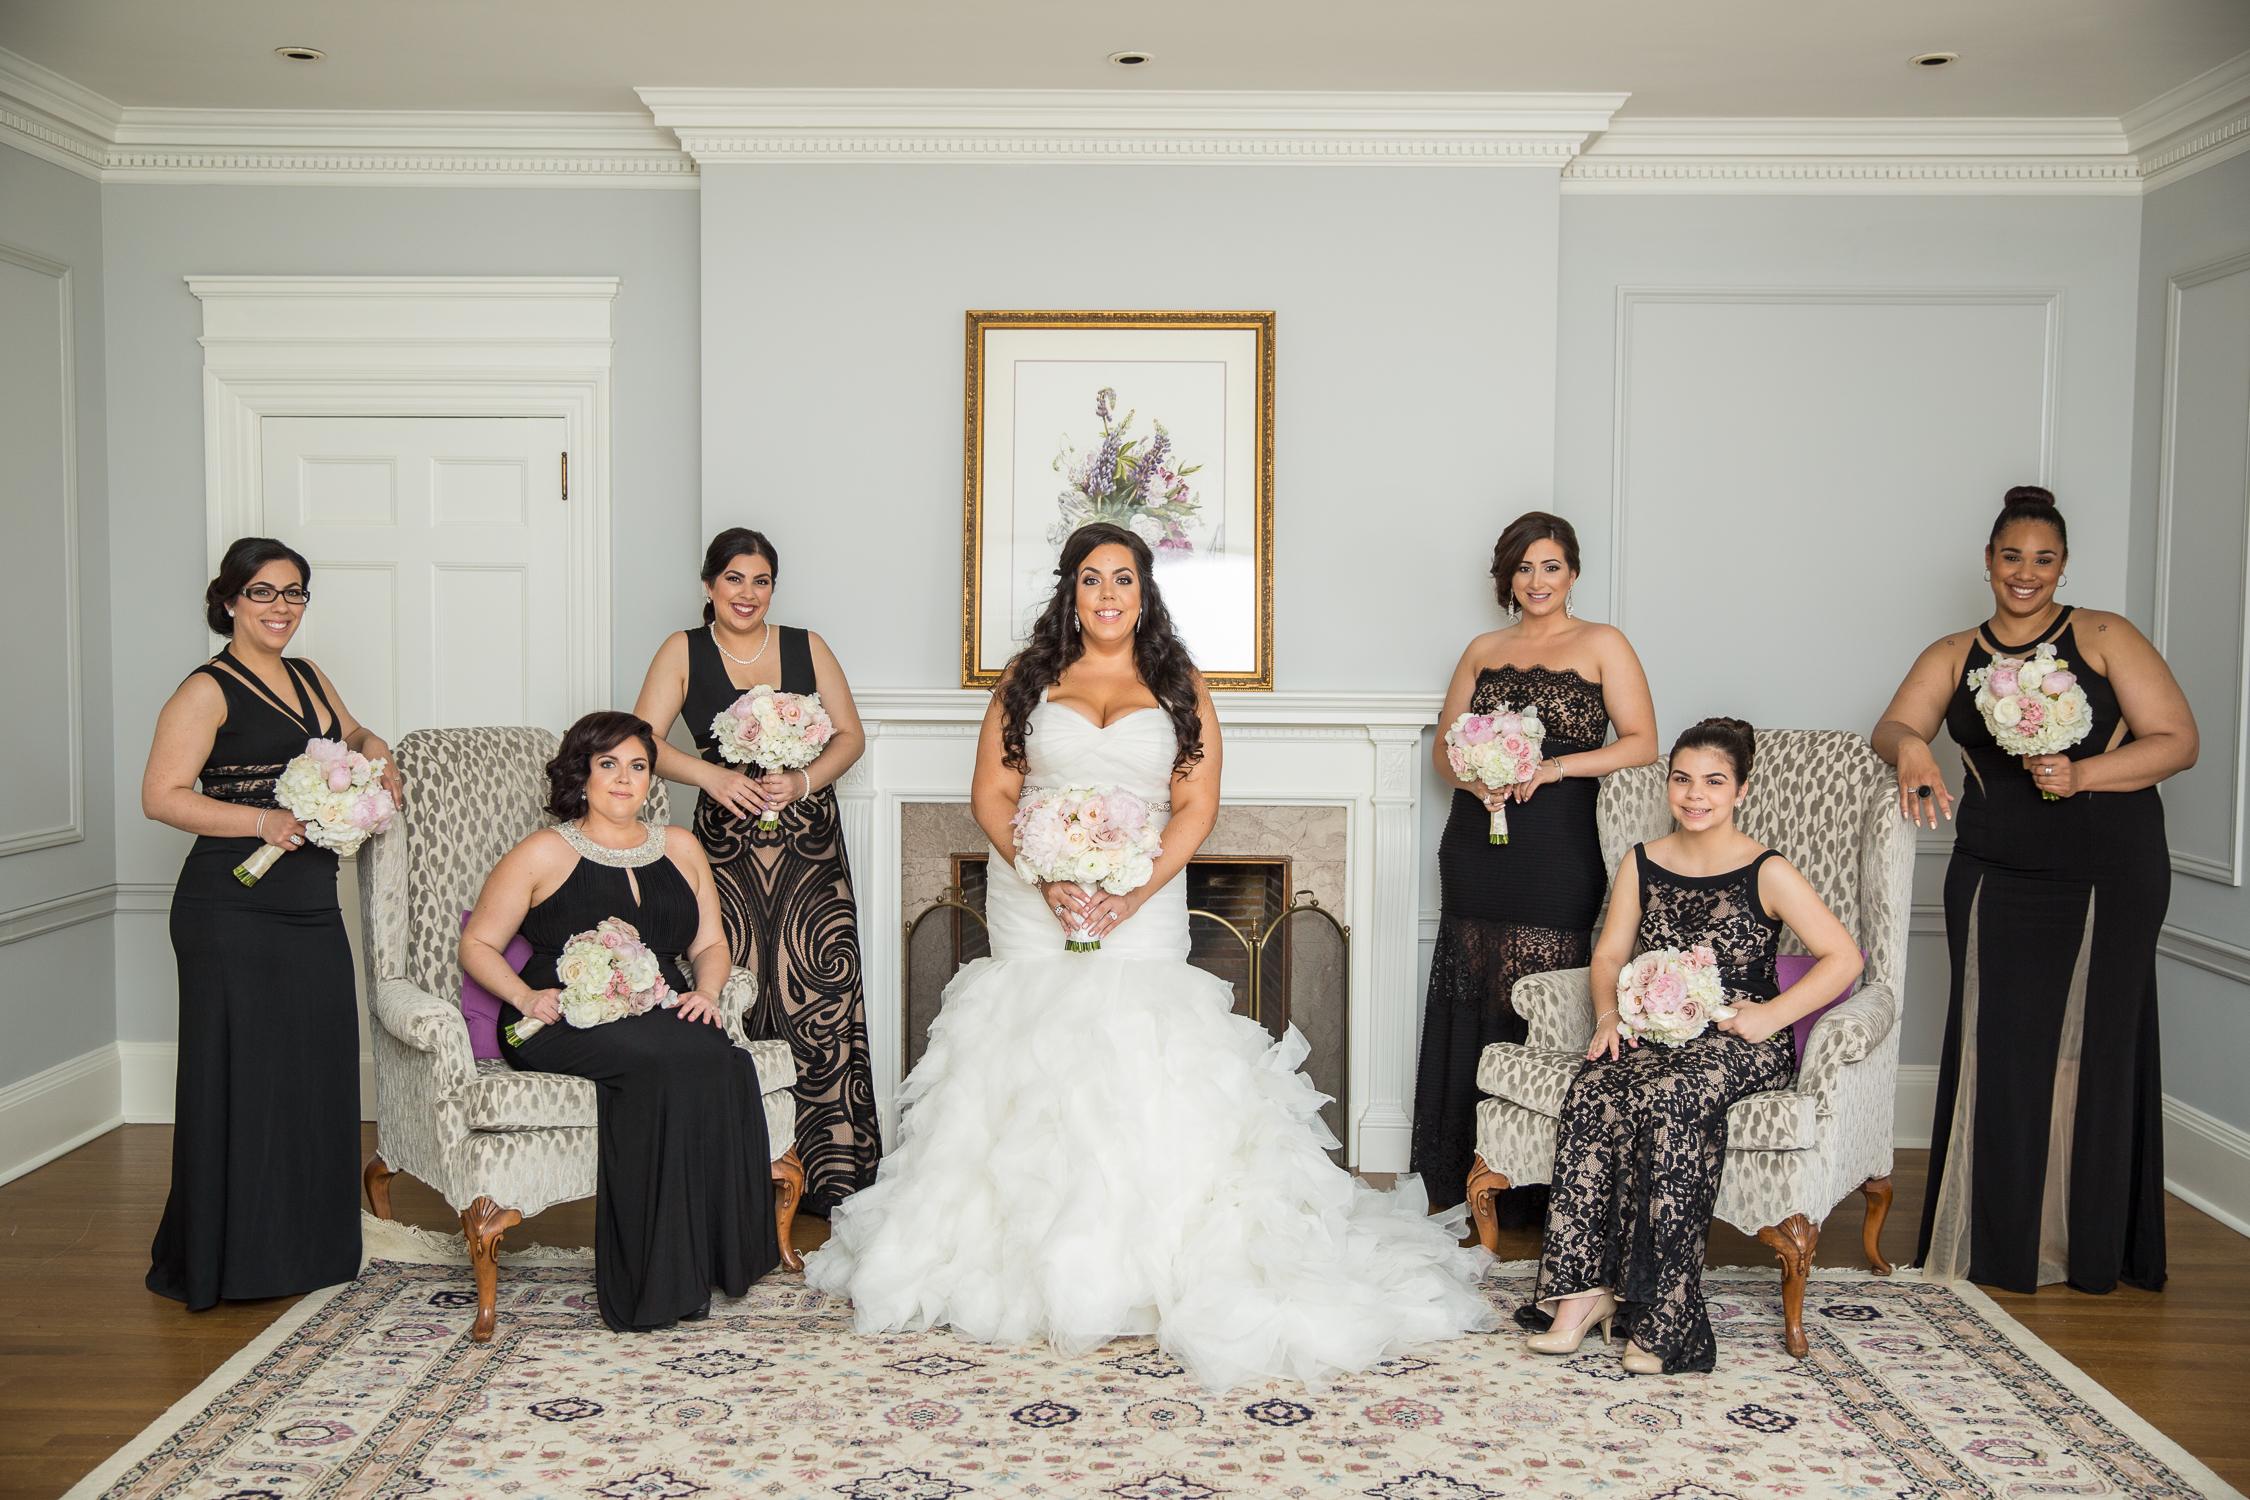 Peter-and-Marie-Wedding-Fontana-Primavera-Graydon-Hall-Manor-Toronto-Ontario-Canada-0018.jpg